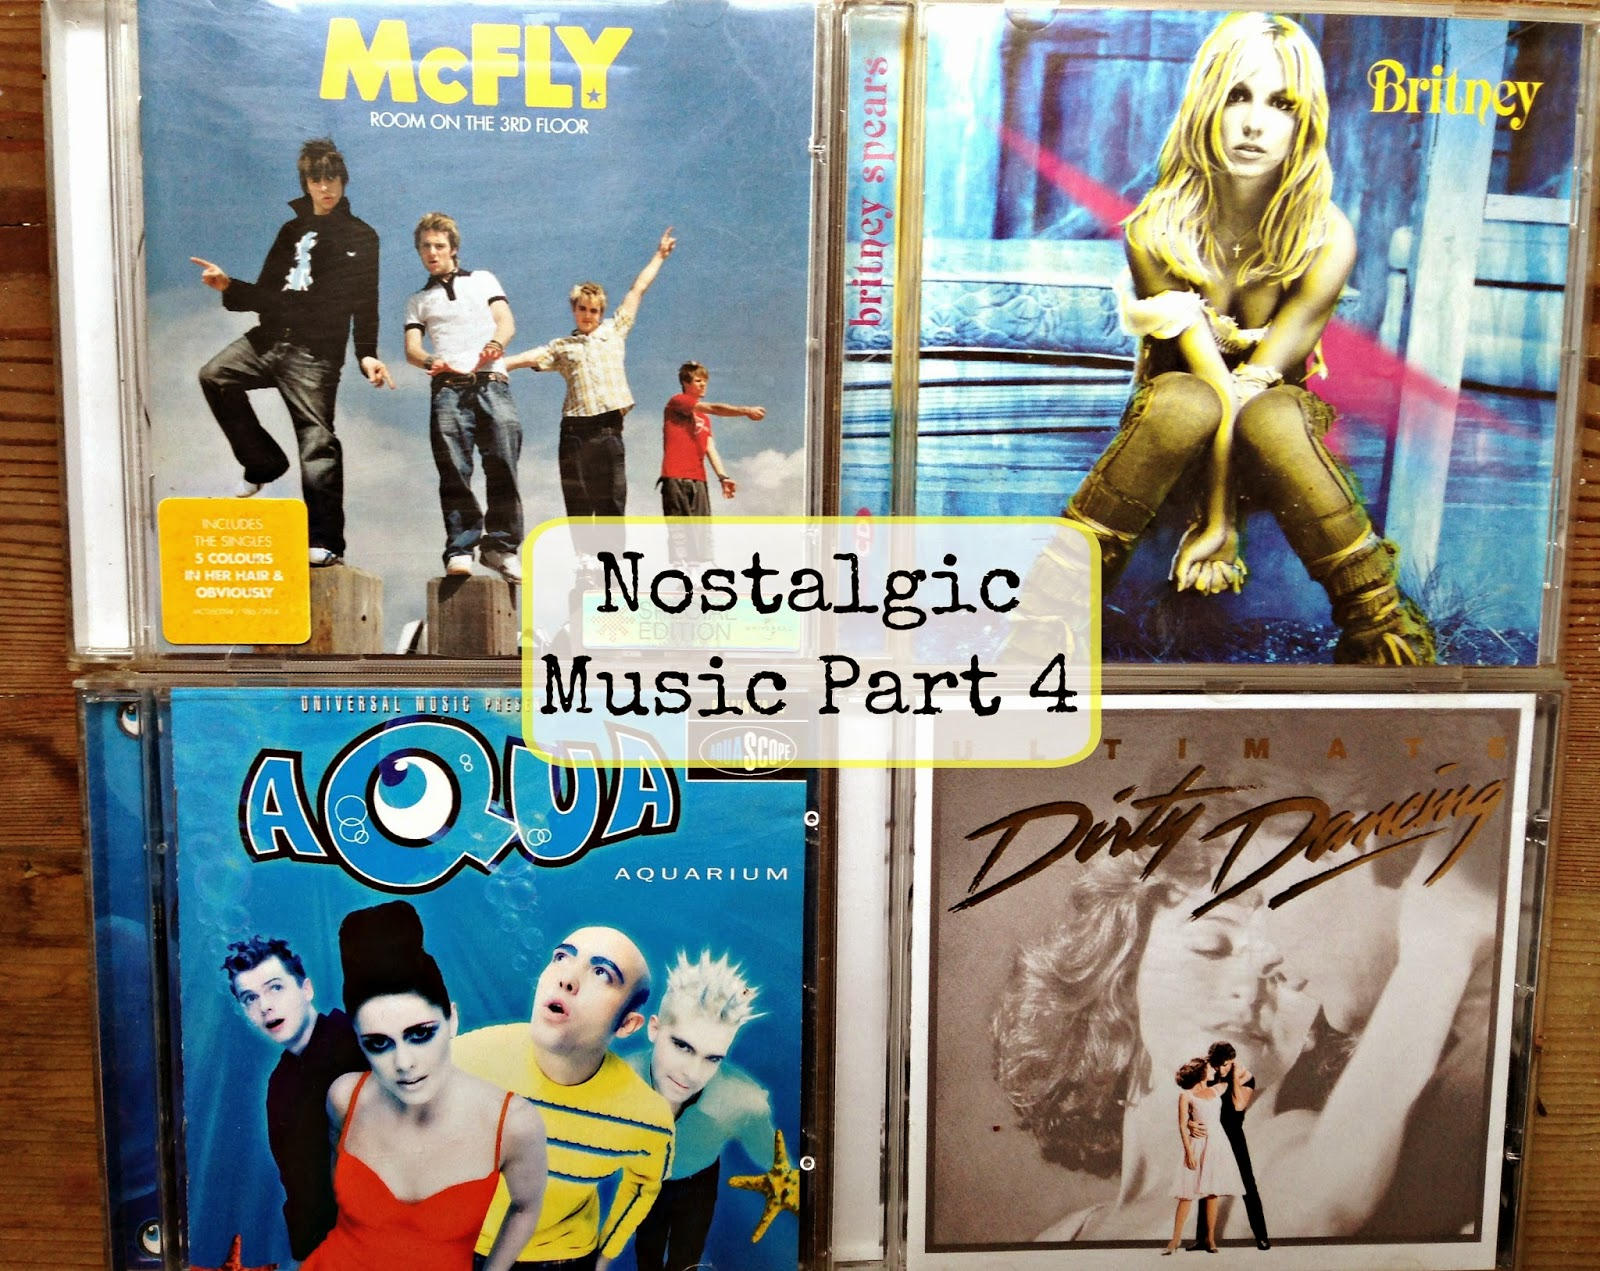 Nostalgic Music Part 4